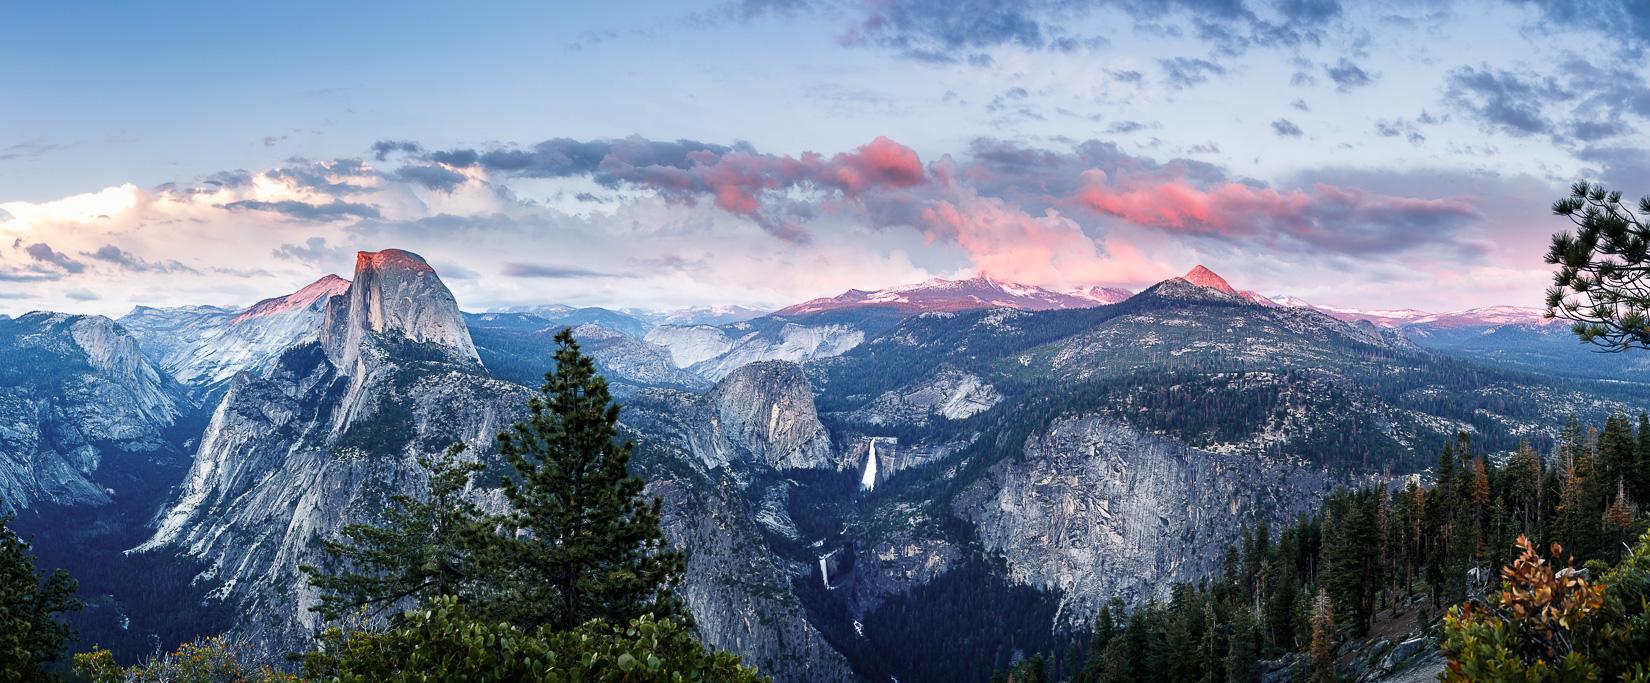 Yosemite Vista | Glacier Point